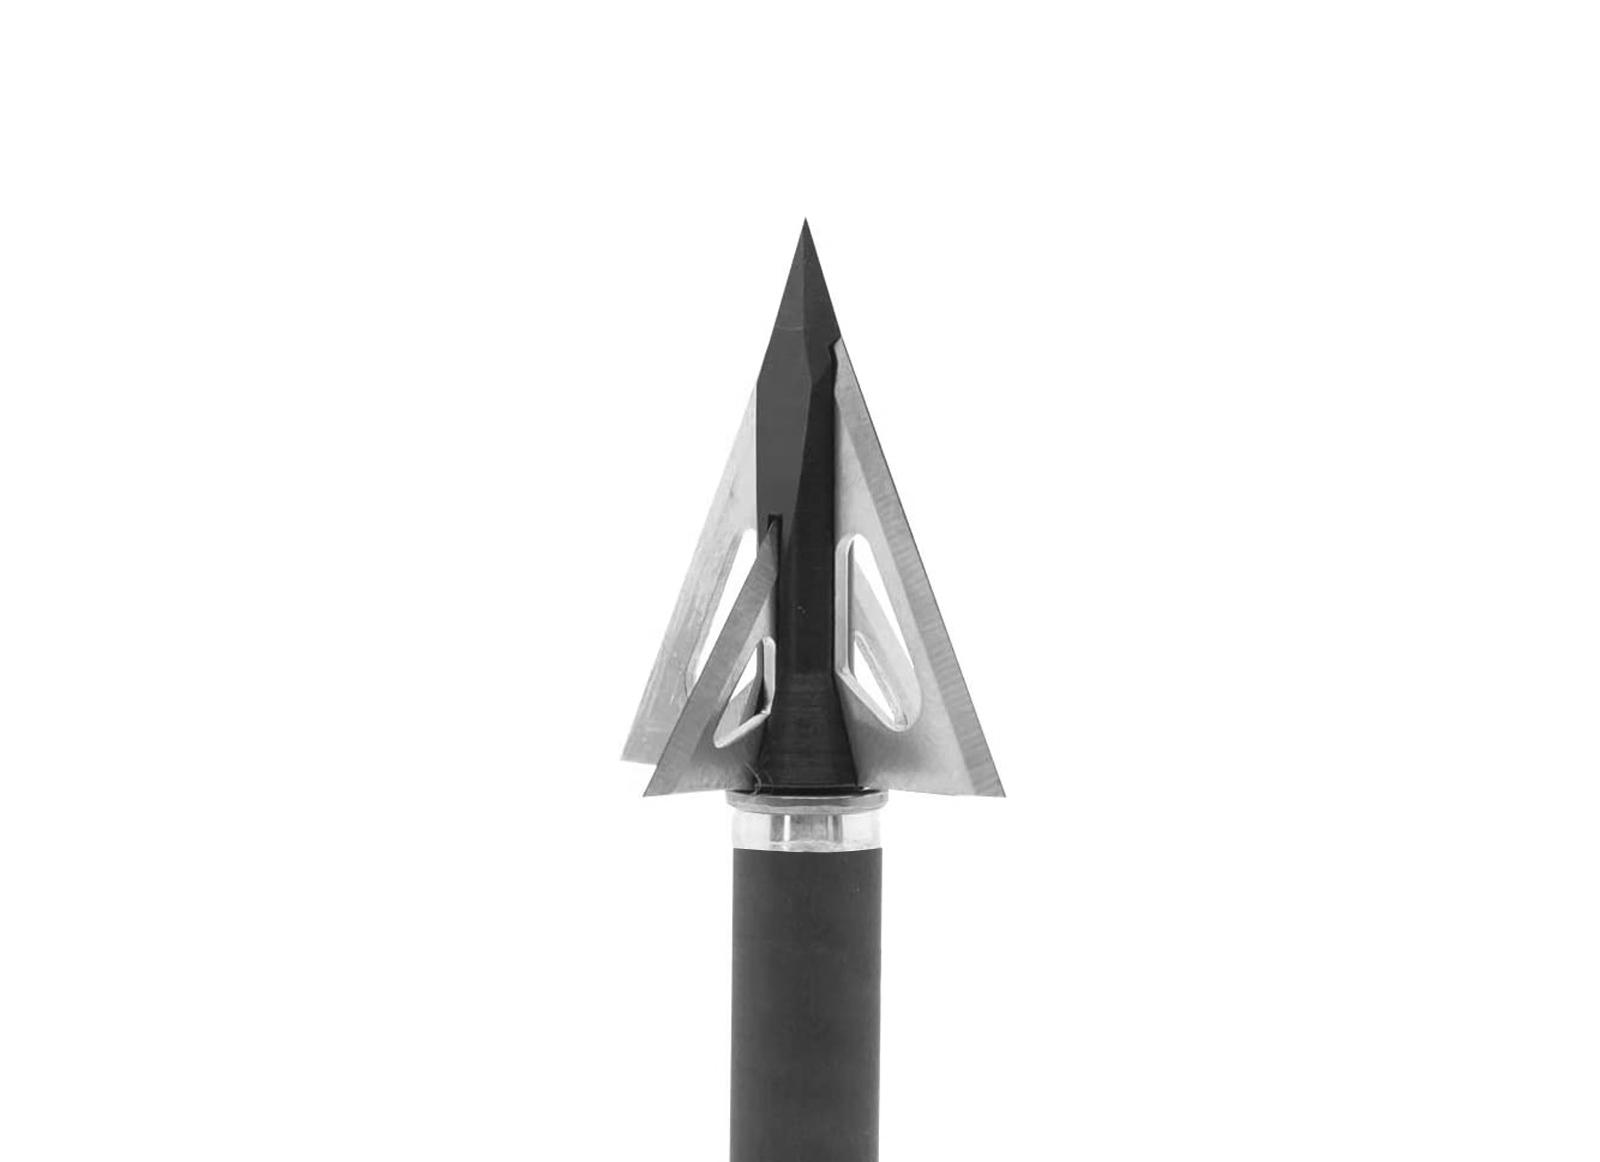 SLICK TRICK PUNTE DA CACCIA VIPERTRICK 1-1/16'' CONFEZIONE DA 4 PZ